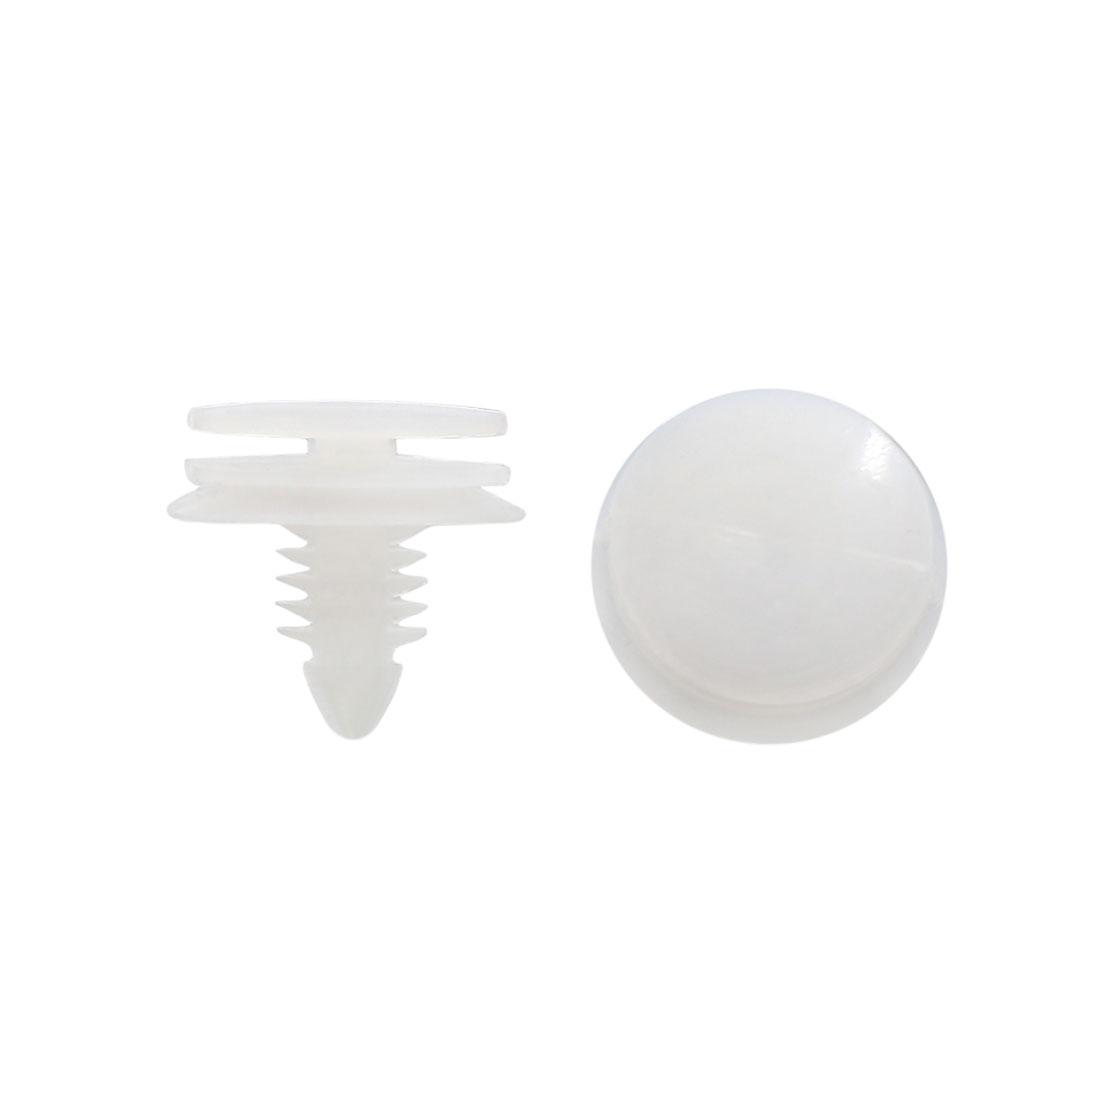 100Pcs White Plastic Rivets Fender Bumper Push Type Fastener Clip 7 x 8mm for Car